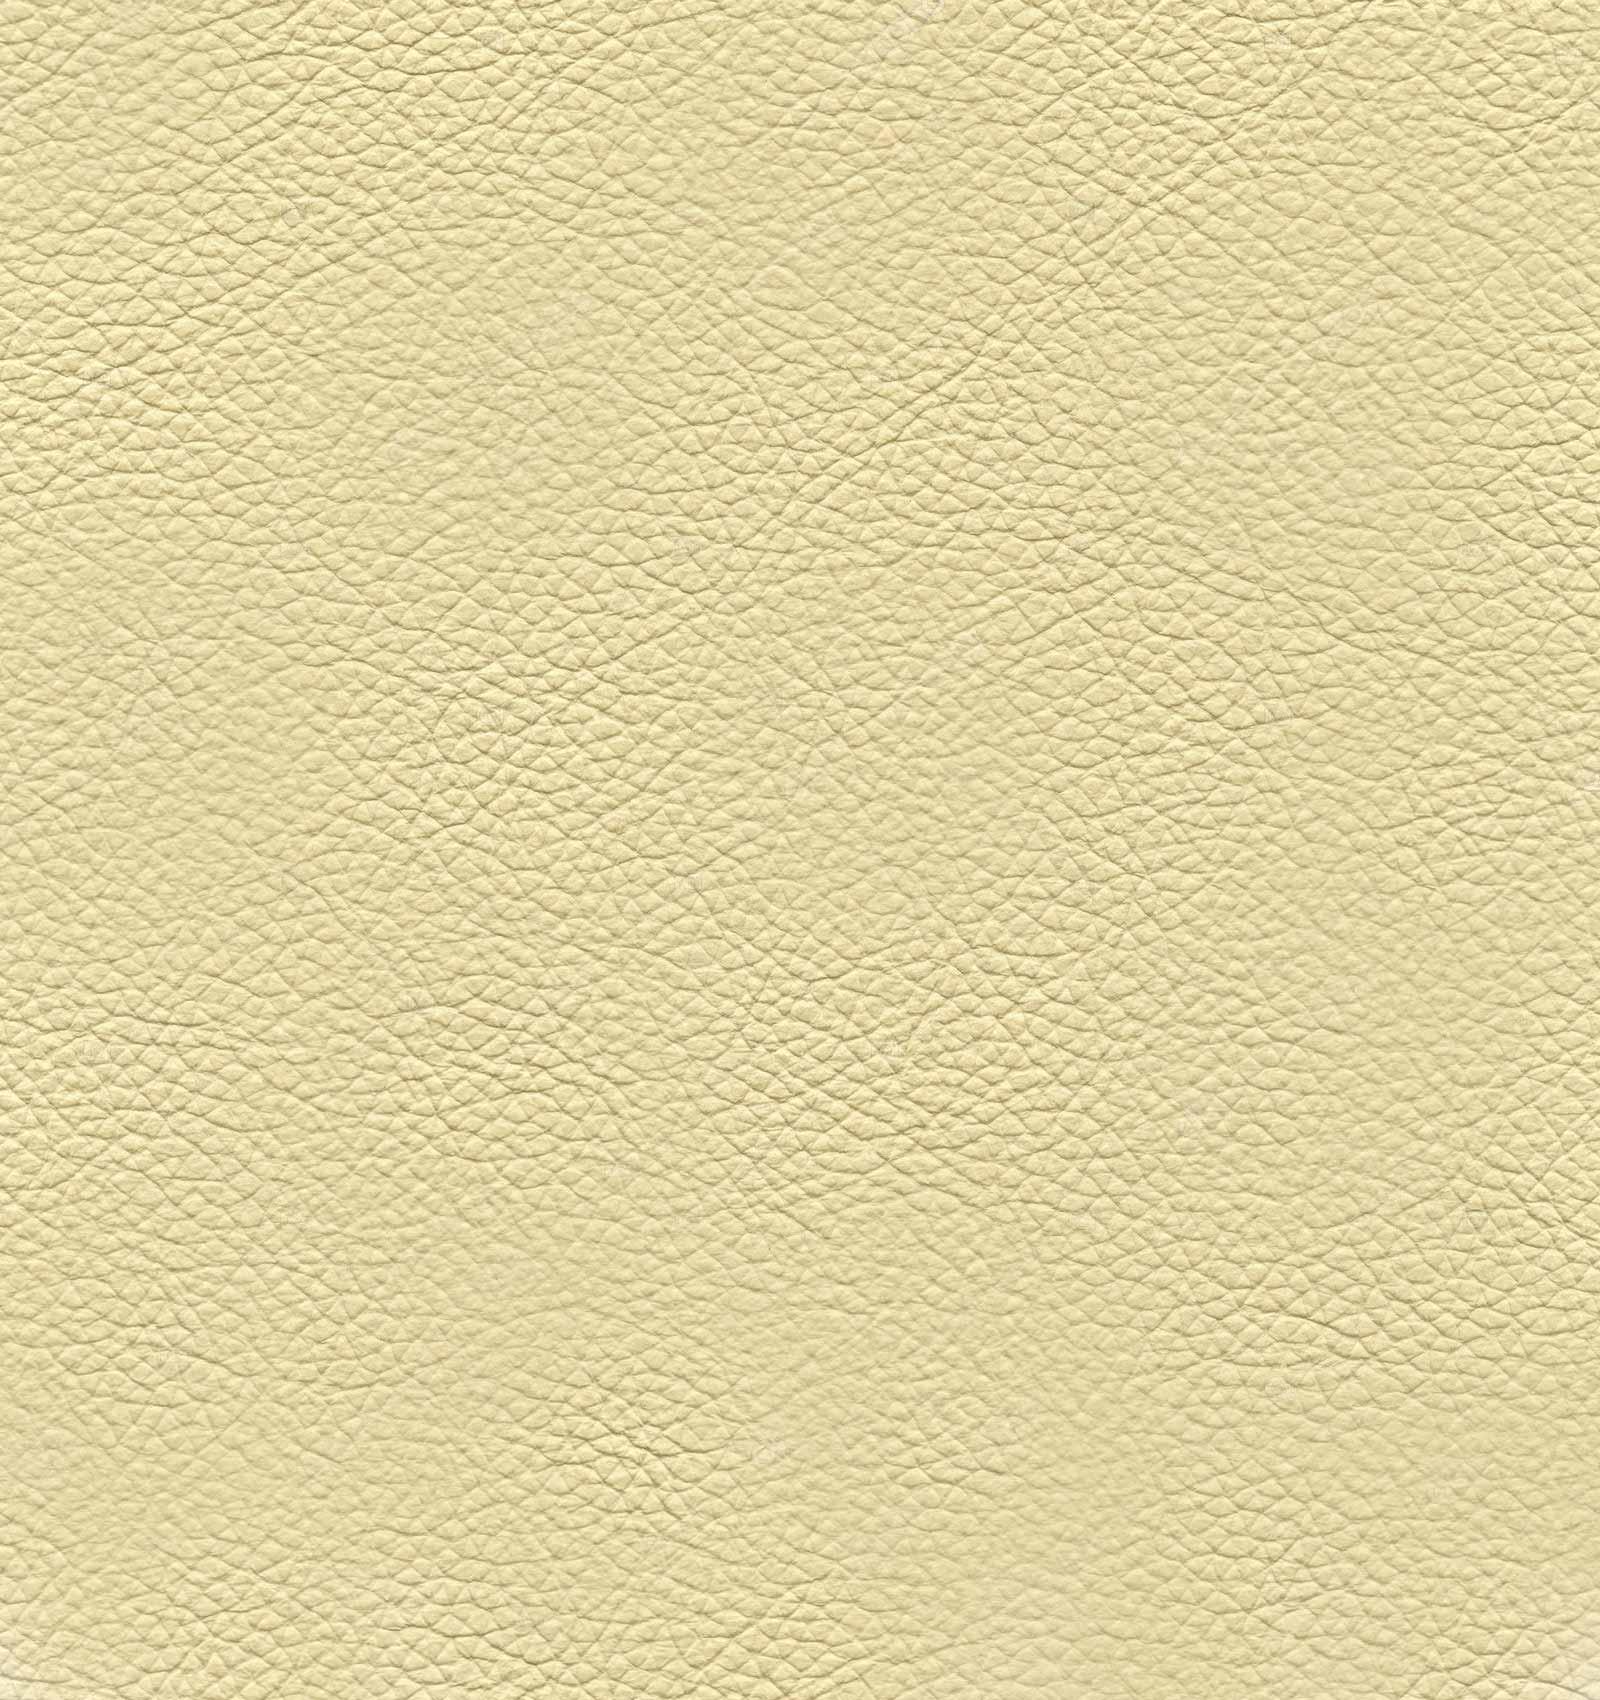 Adesivo Texturizado em Couro - Corino Bege